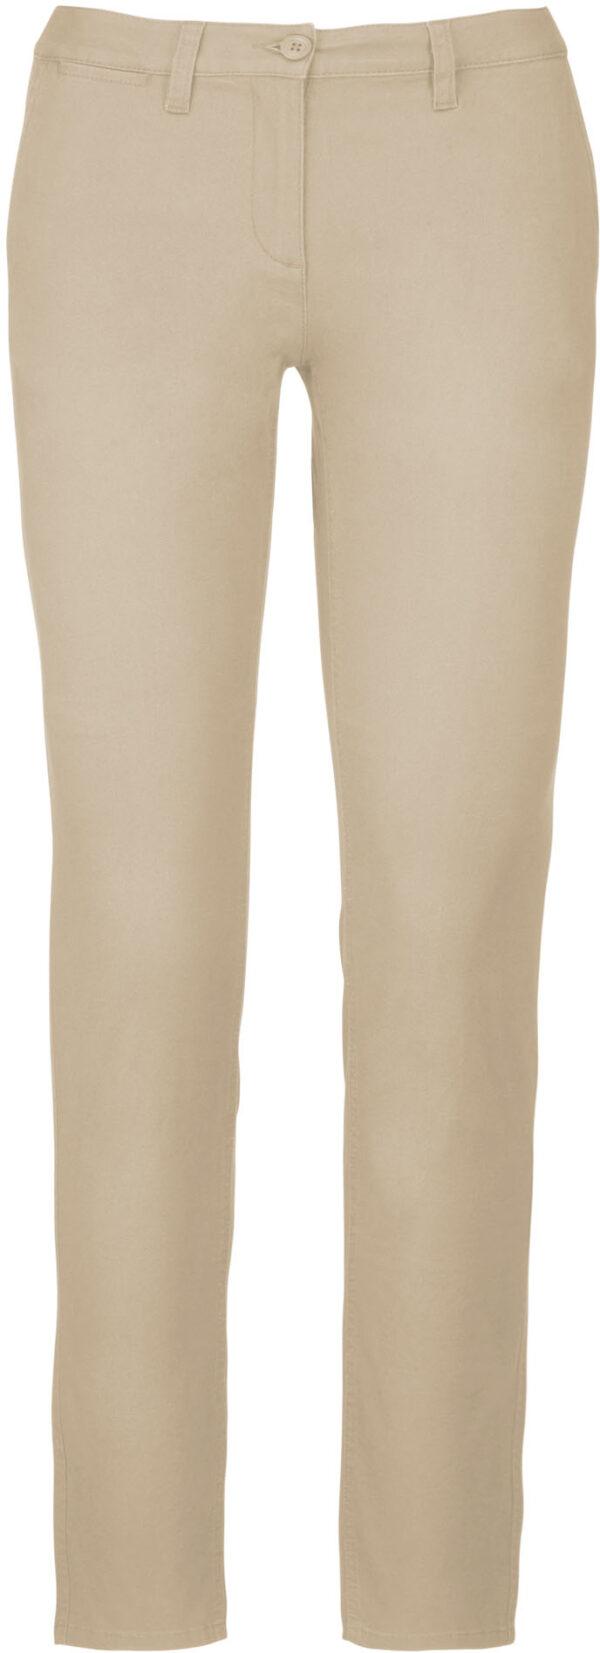 Pantalon Femme Blanc beige